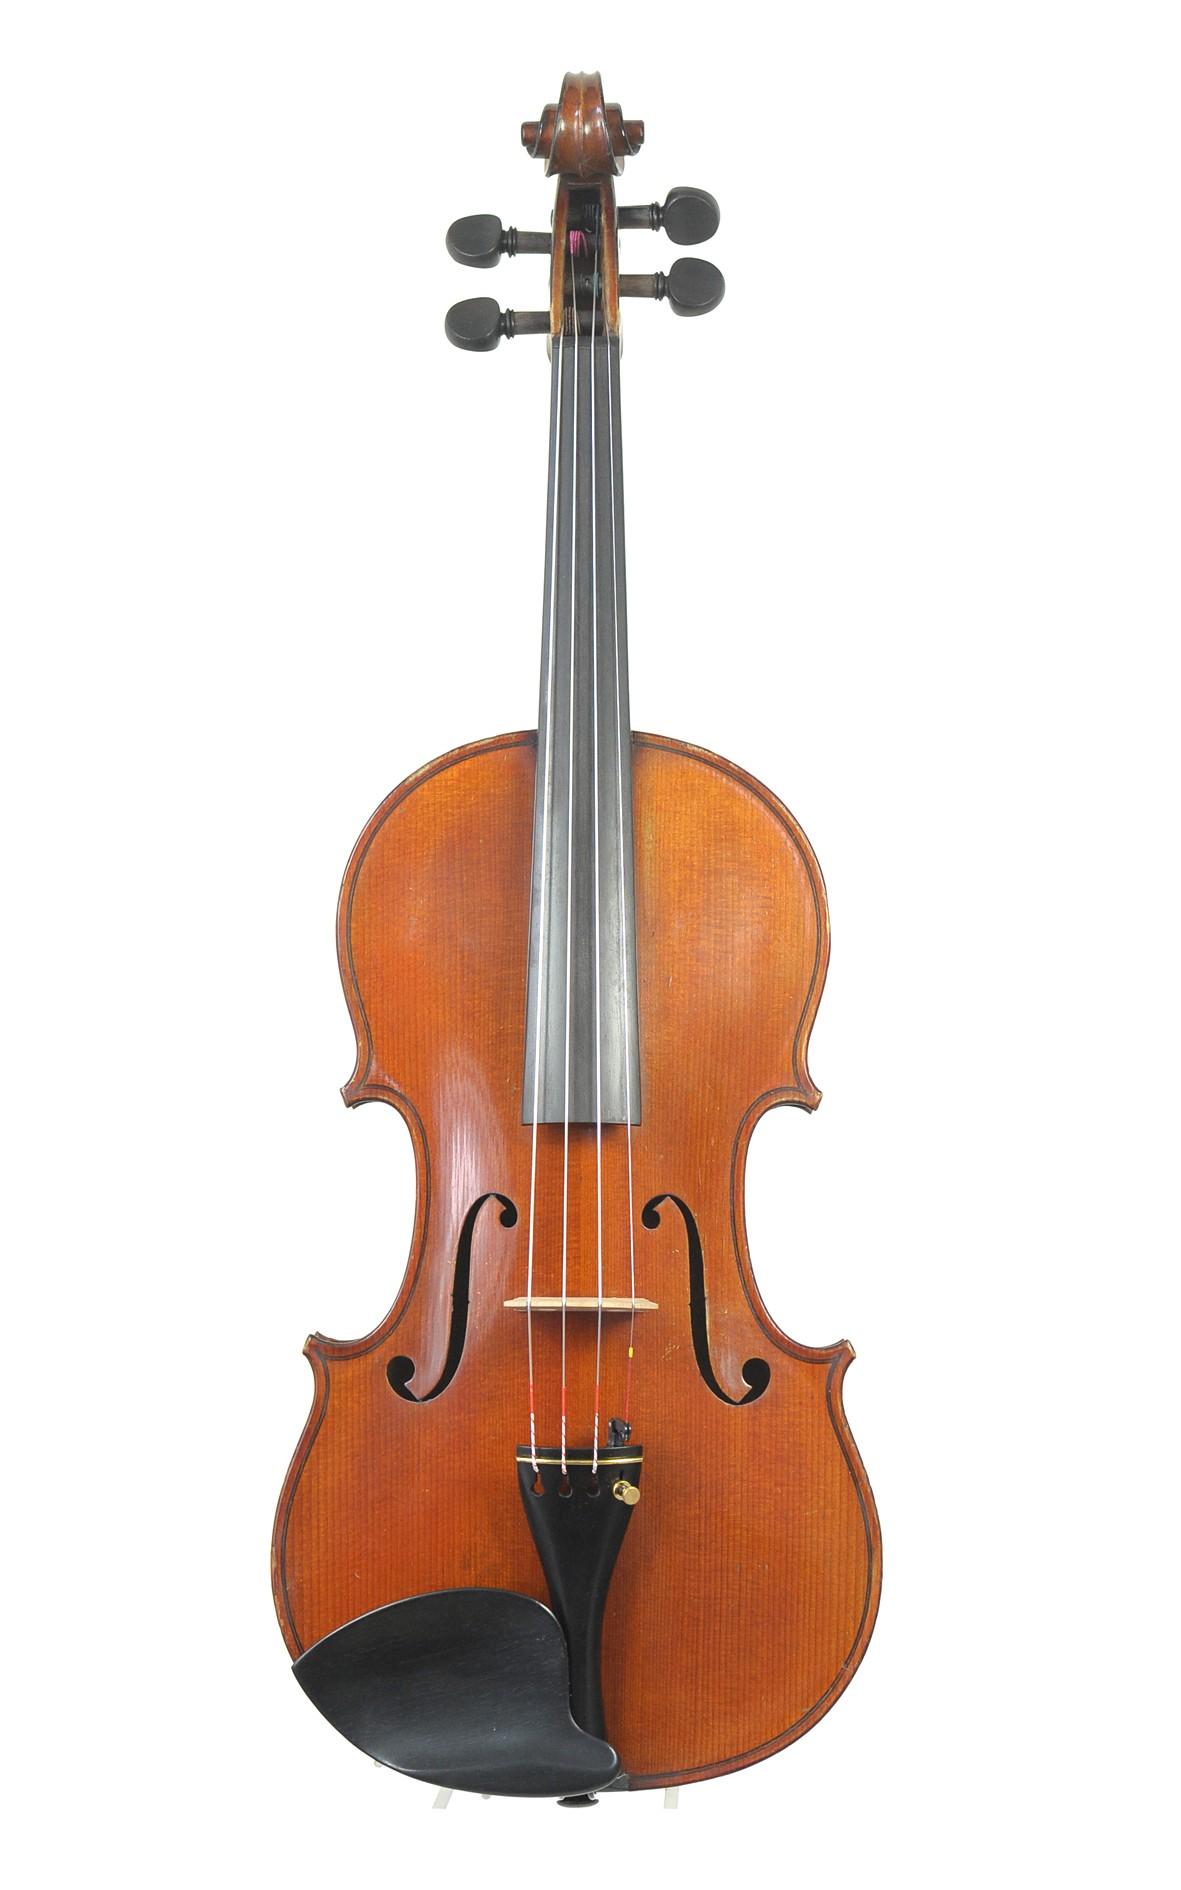 Beare & Son violin c.1920